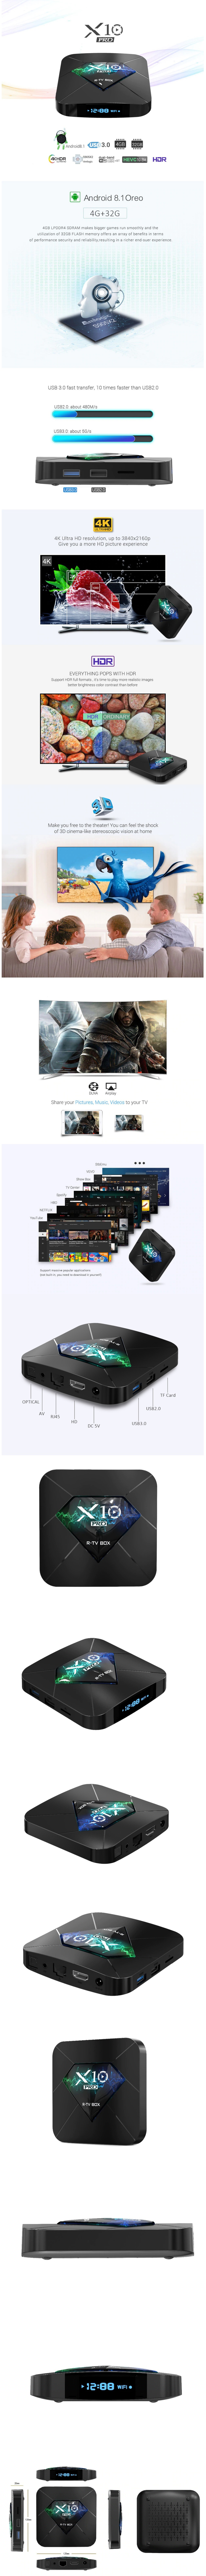 prezentare-R-TV-Box-X10-PRO-329cab3ff3fd4203c3.png